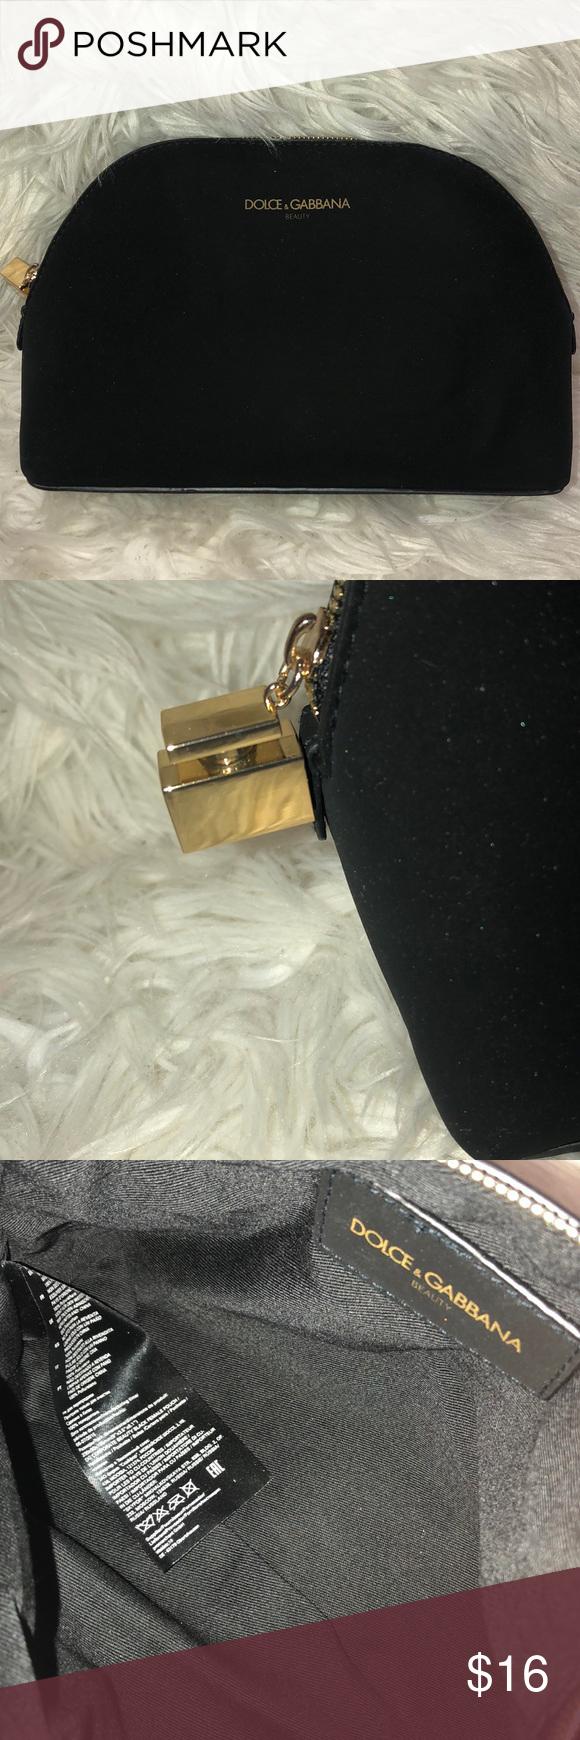 Dolce & Gabbana beauty makeup bag black very chic